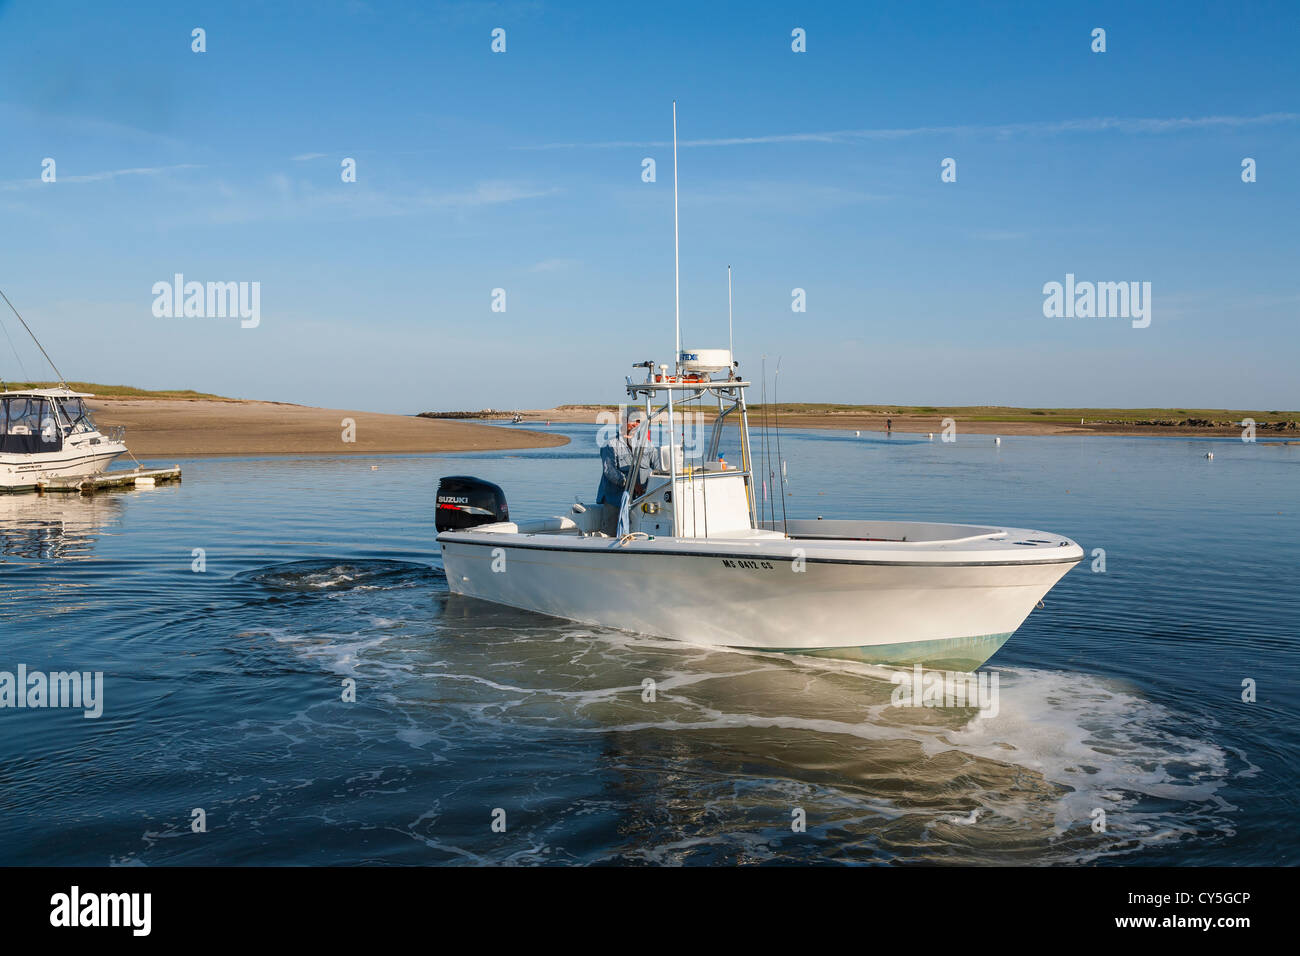 Good Skippers Cape Cod Part - 4: Charter Boat Skipper Maneuvers Off Dock. Pamet River Boat Ramp. Cape Cod.  USA.